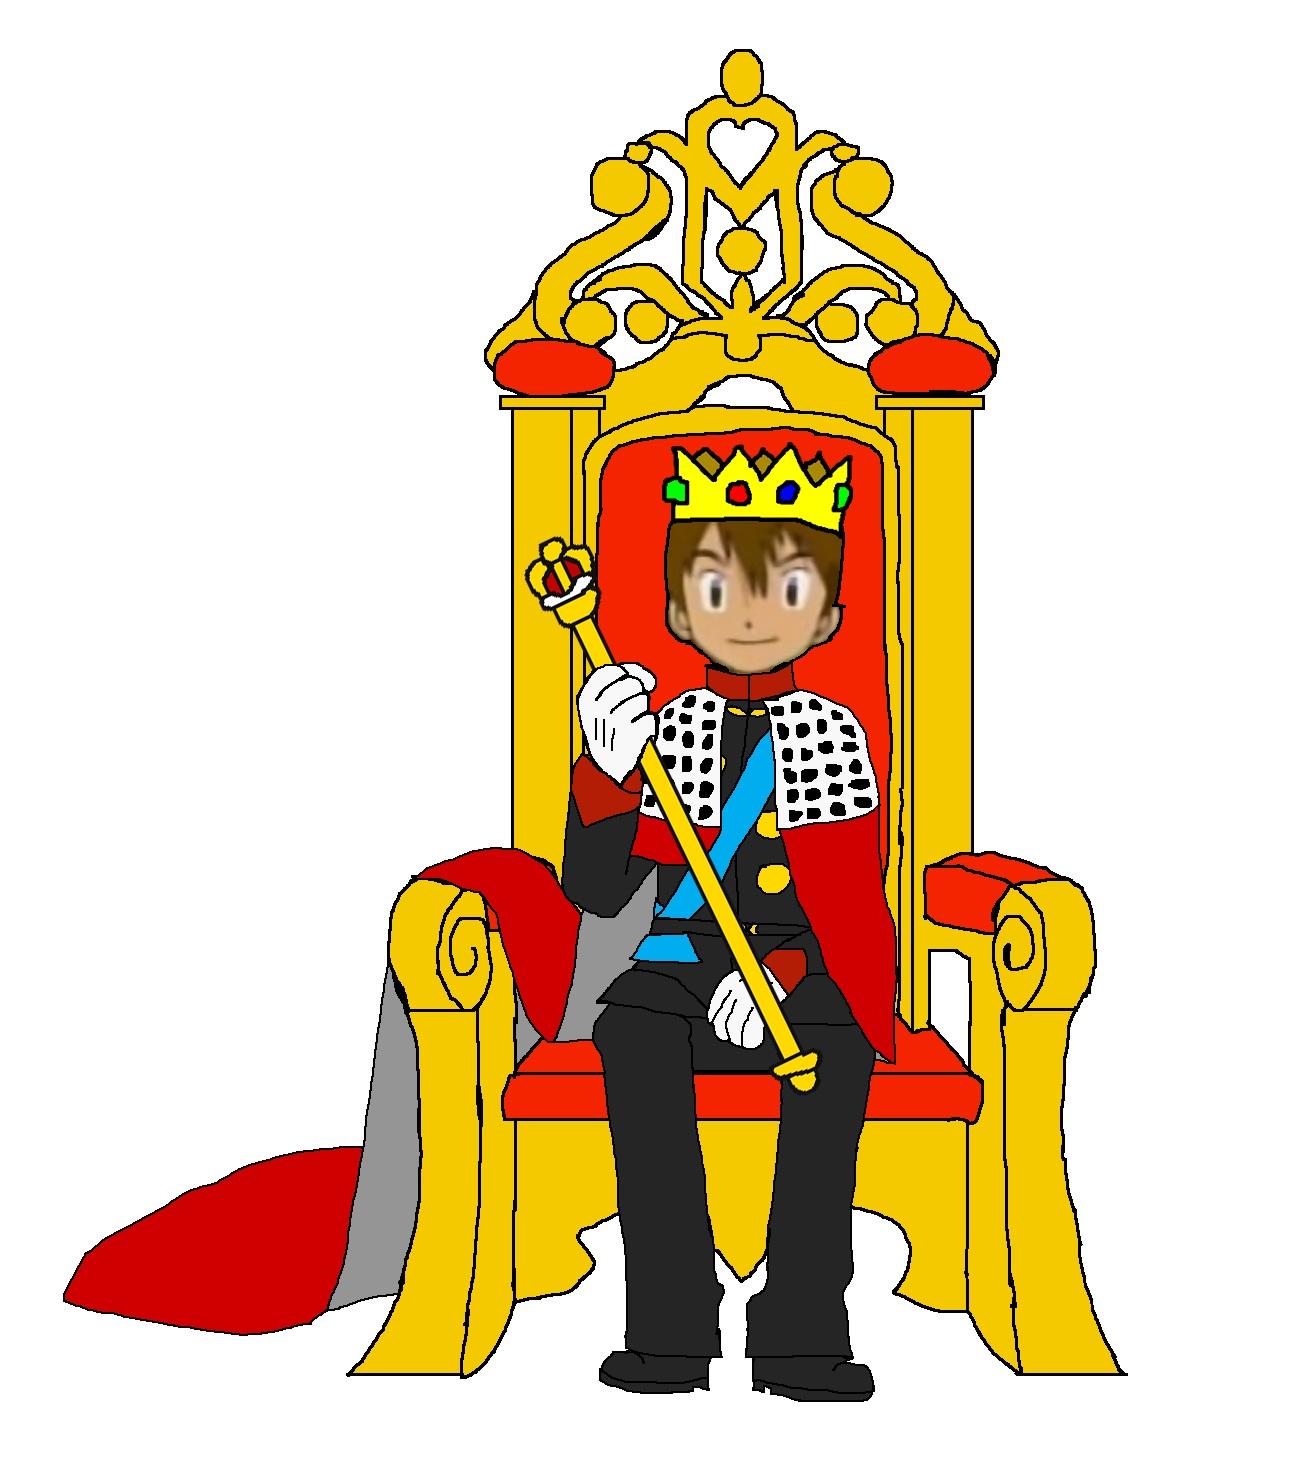 King On Throne Clipart-King On Throne Clipart-19